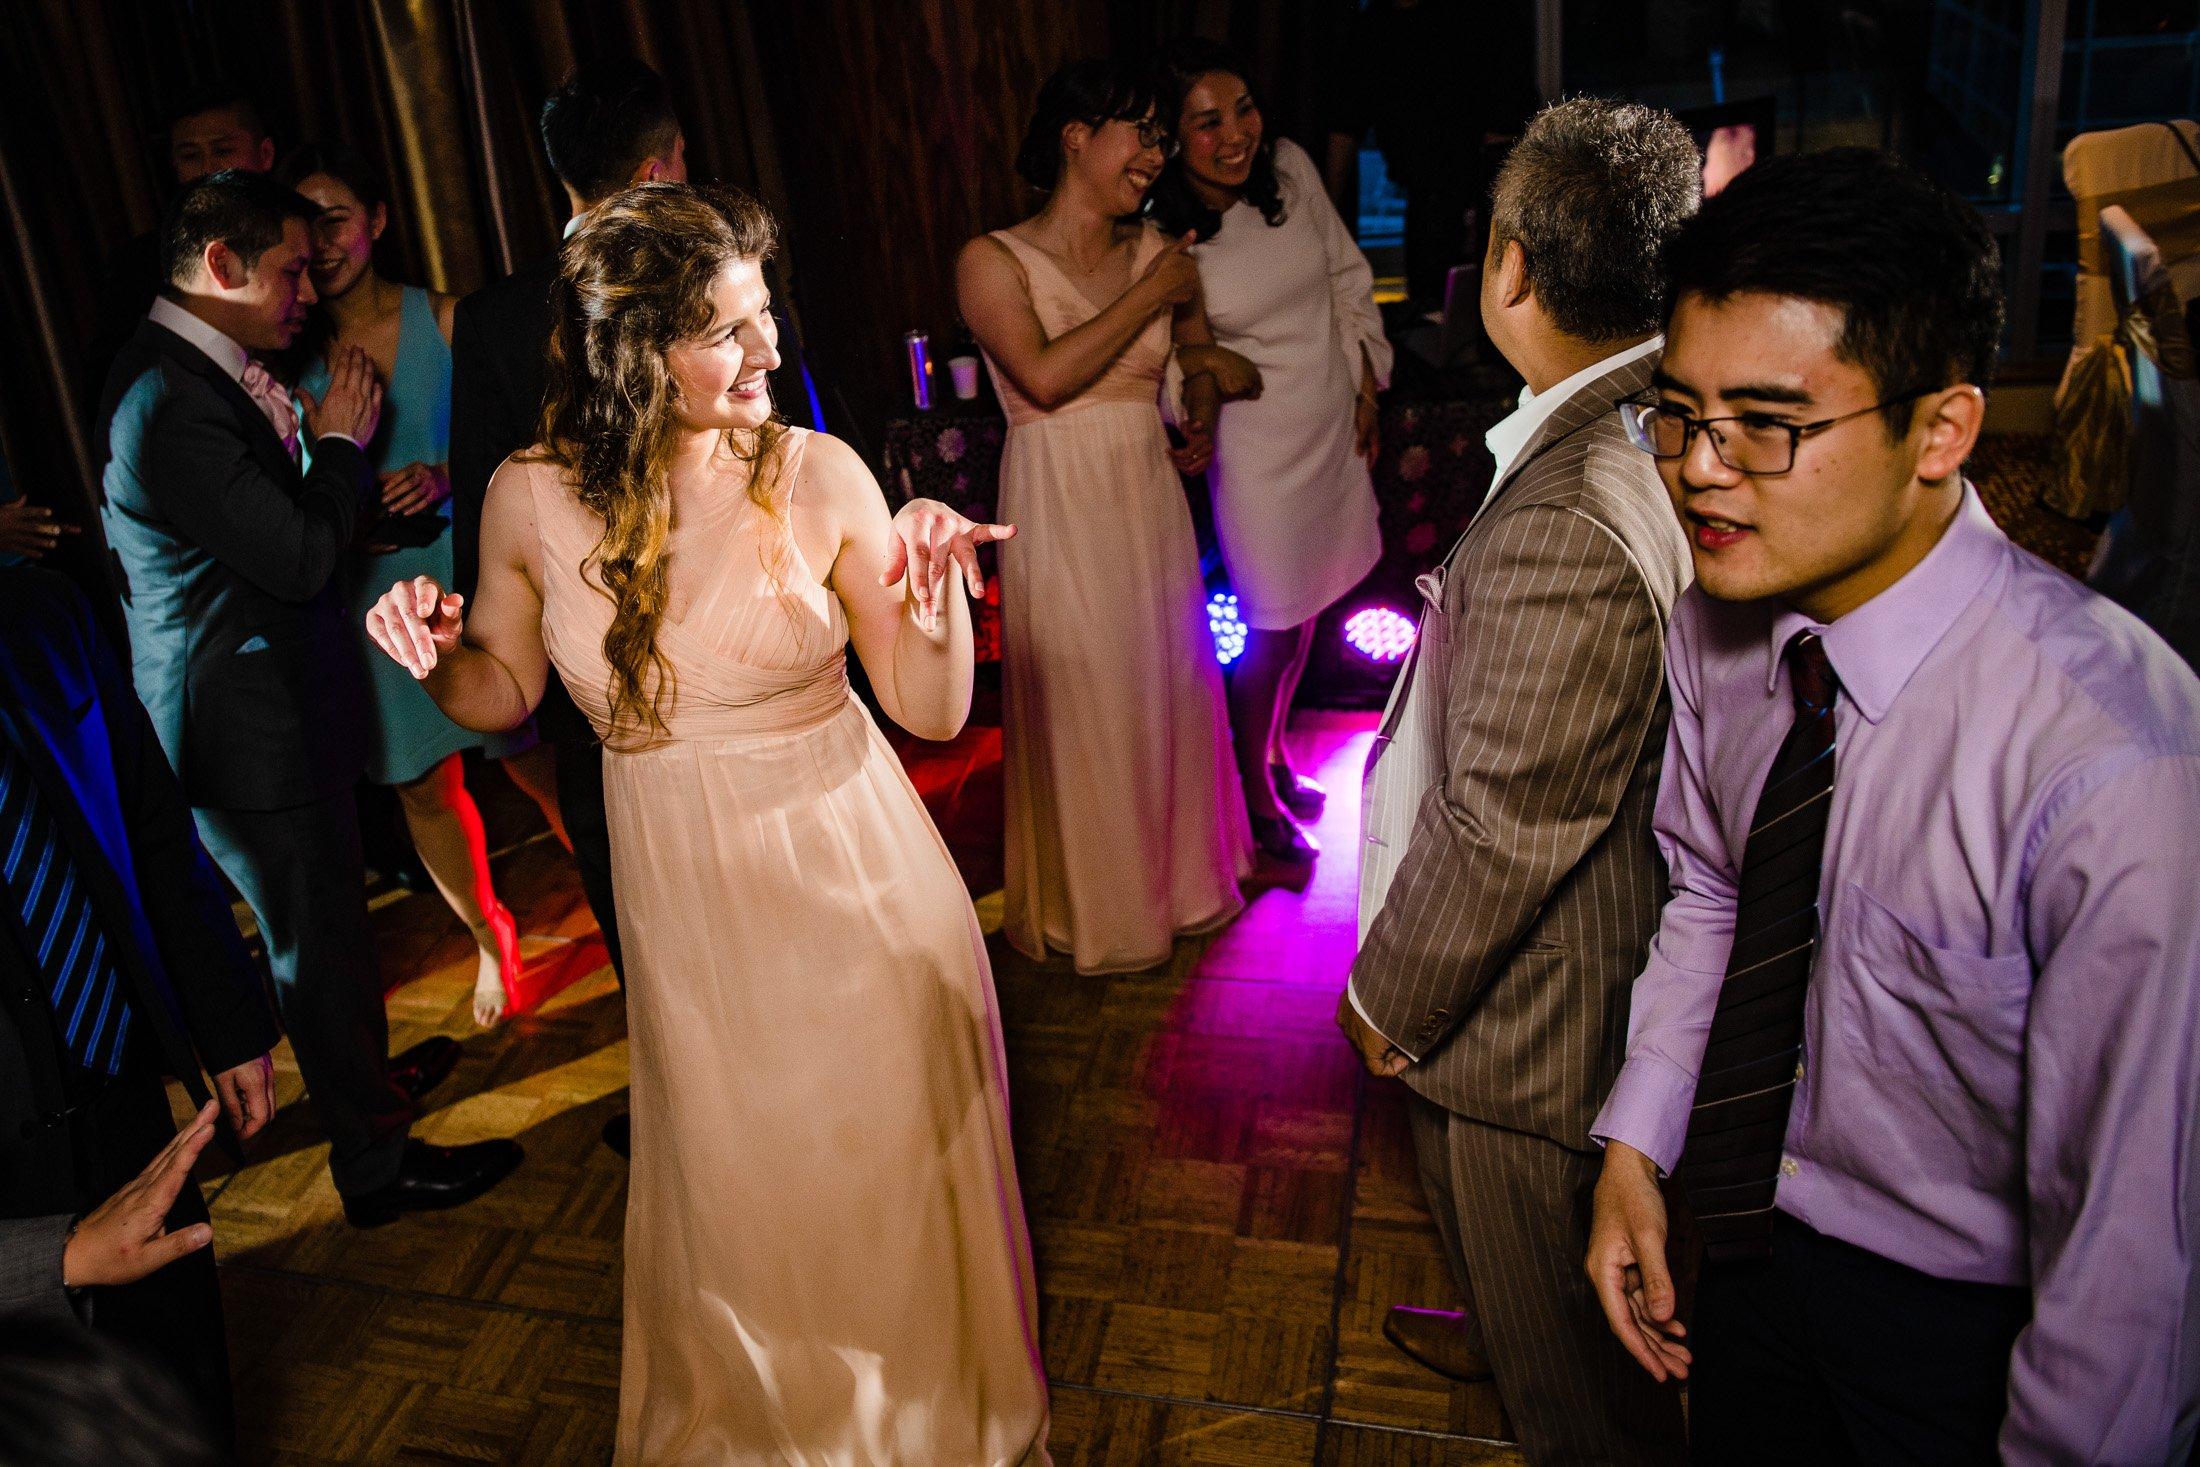 021 - dance shangri-la